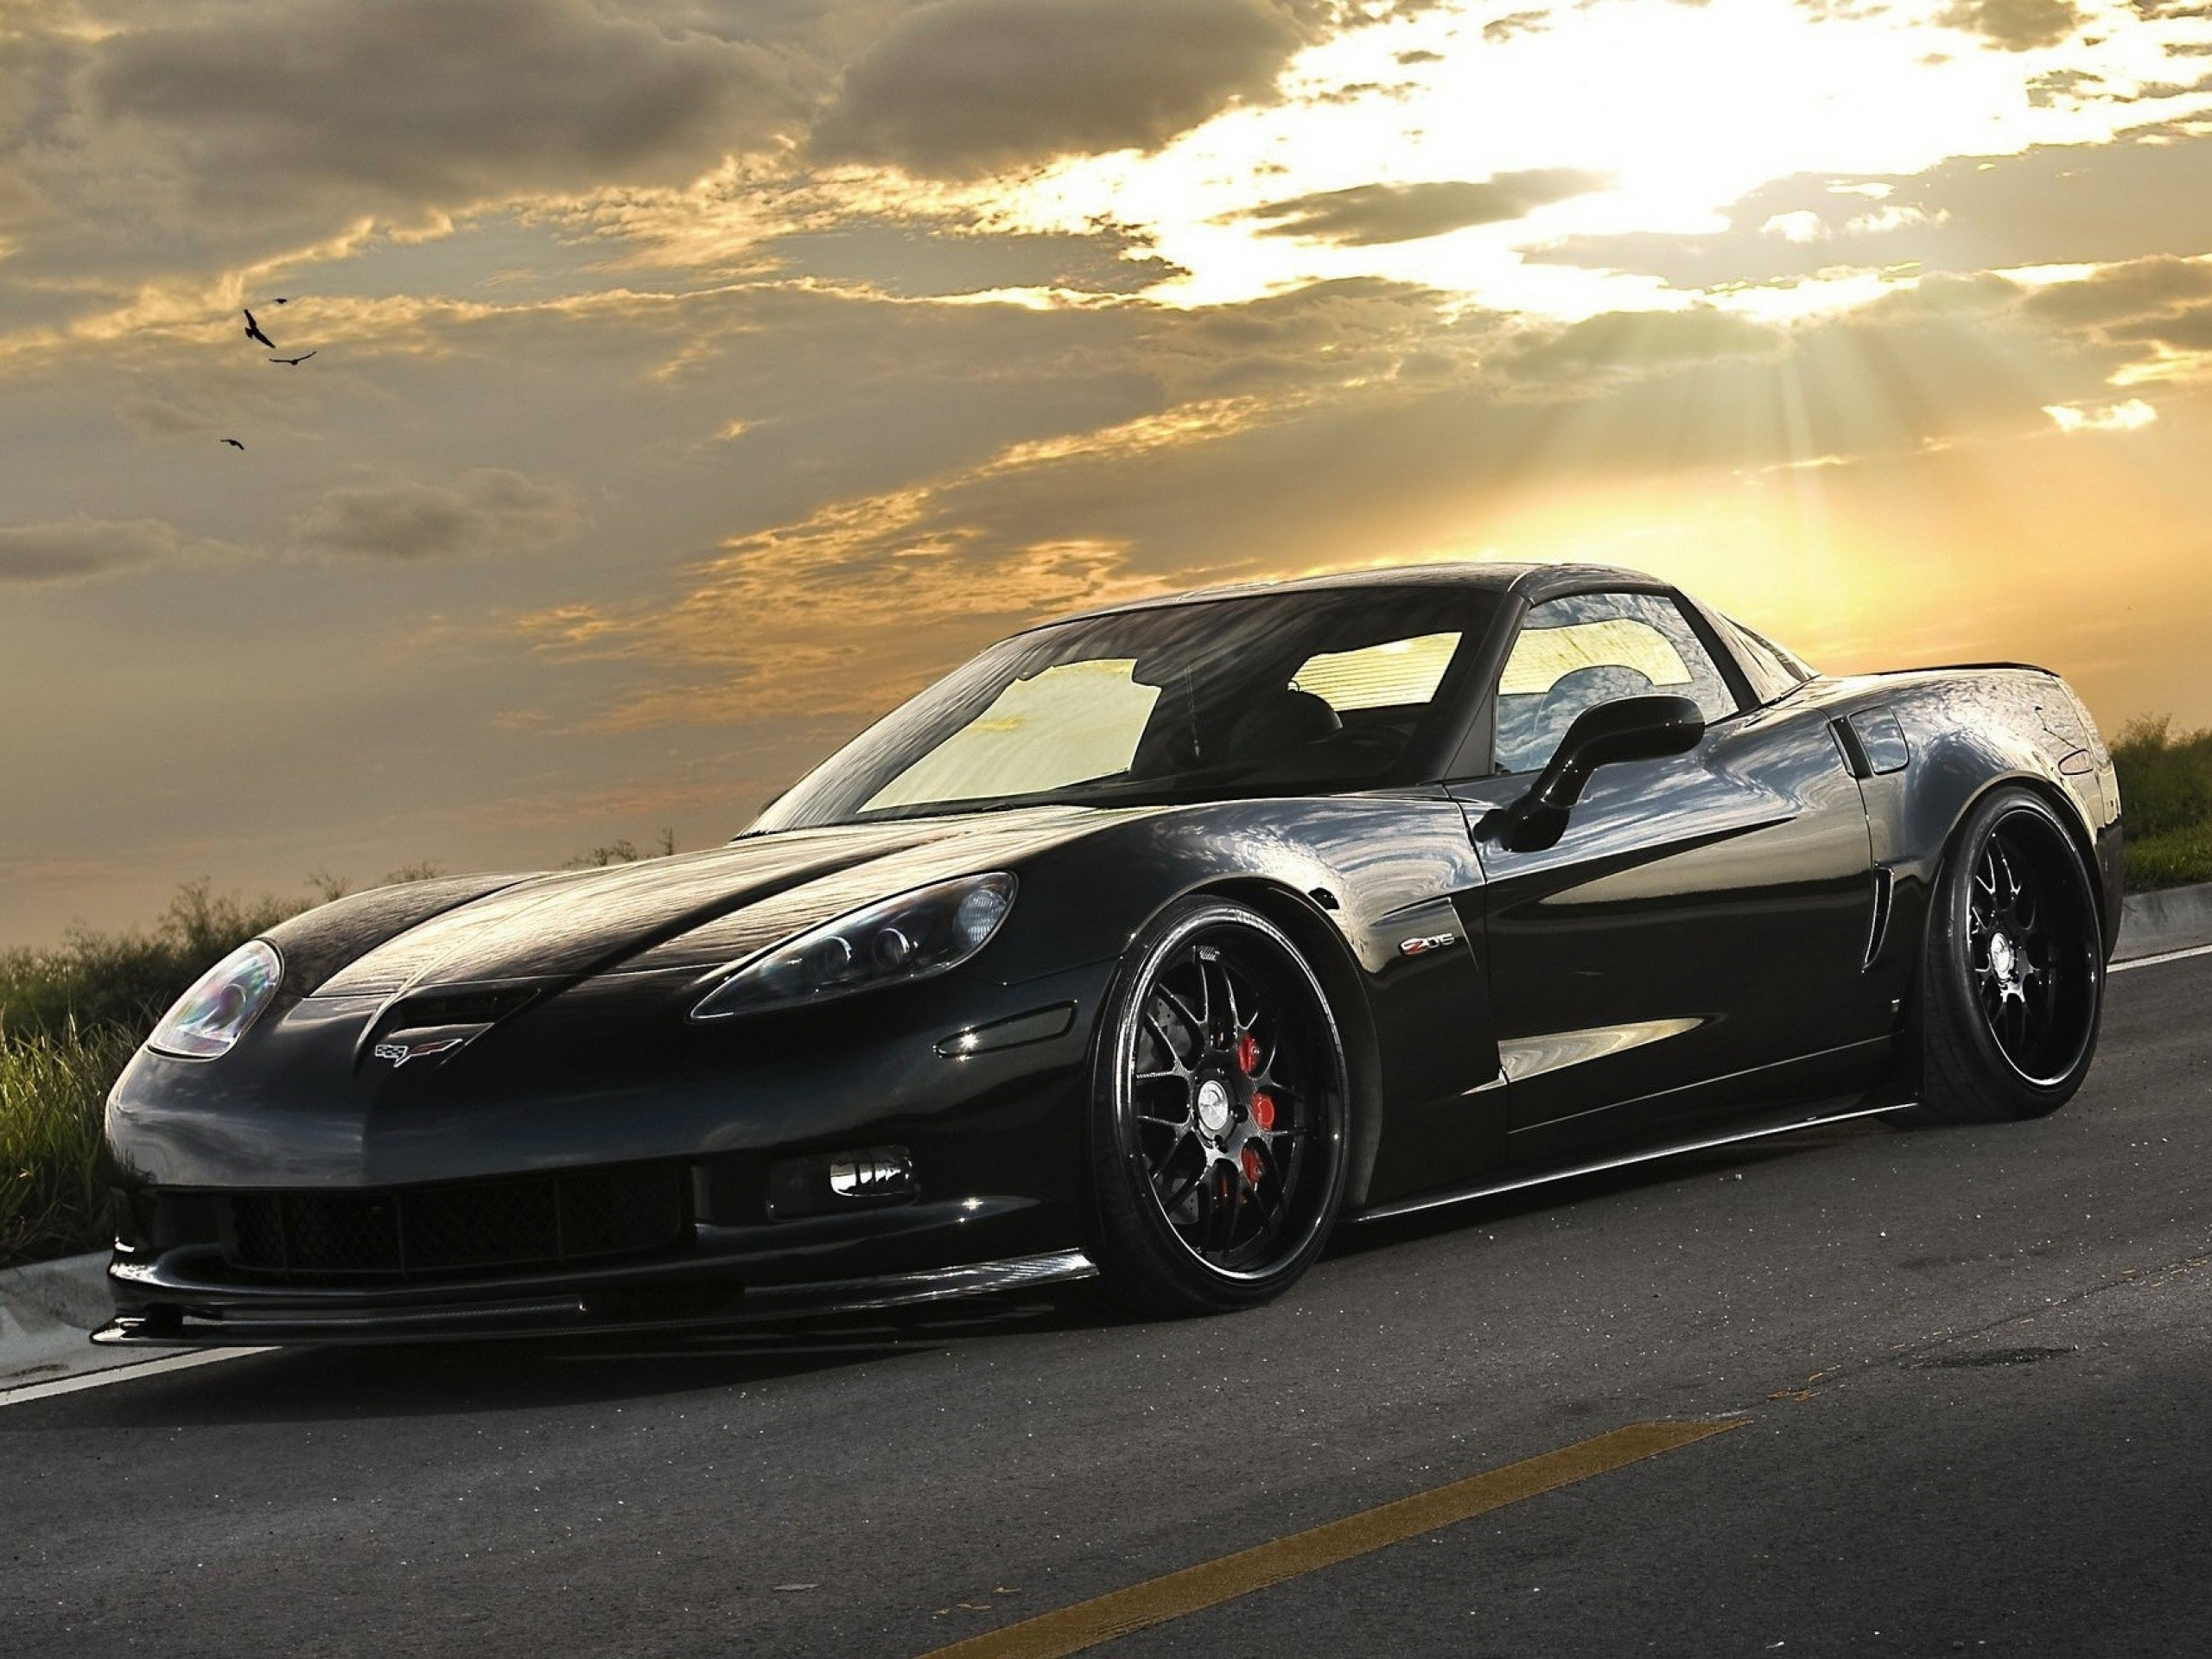 Black Chevrolet Corvette Wallpaper Hd 5958 Wallpaper Wallpaper hd 2560x1920